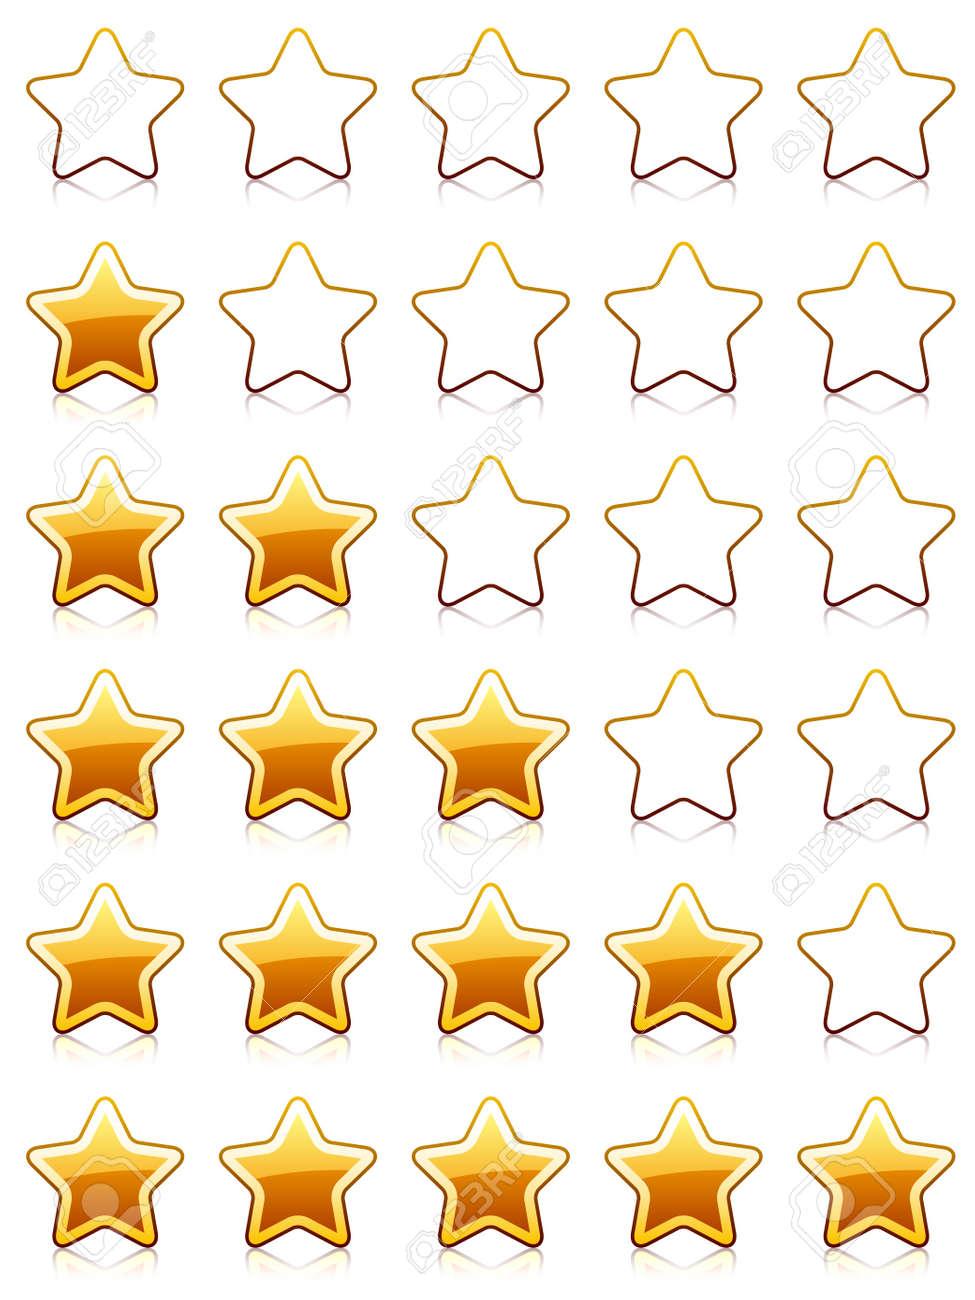 Rating Stars Royalty Free Cliparts, Vectors, And Stock ...